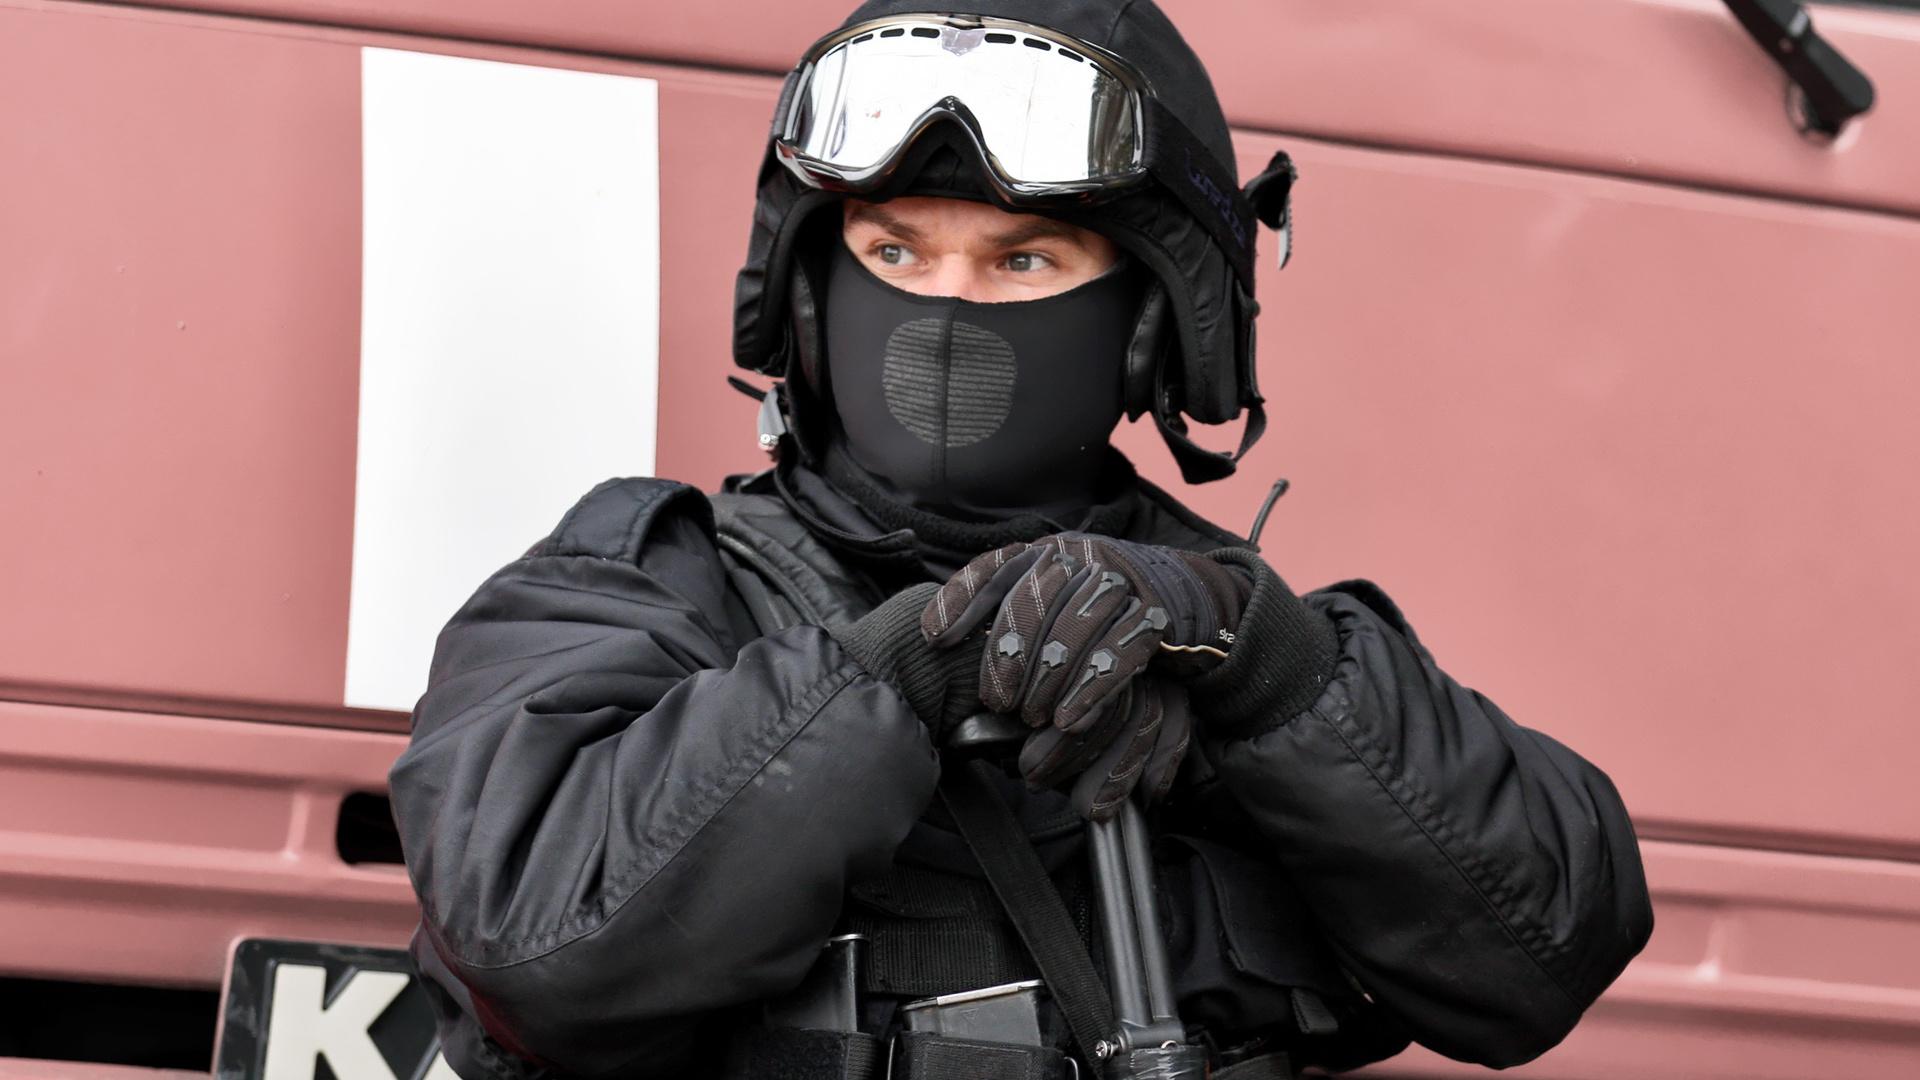 спецназ в крутых масках фото